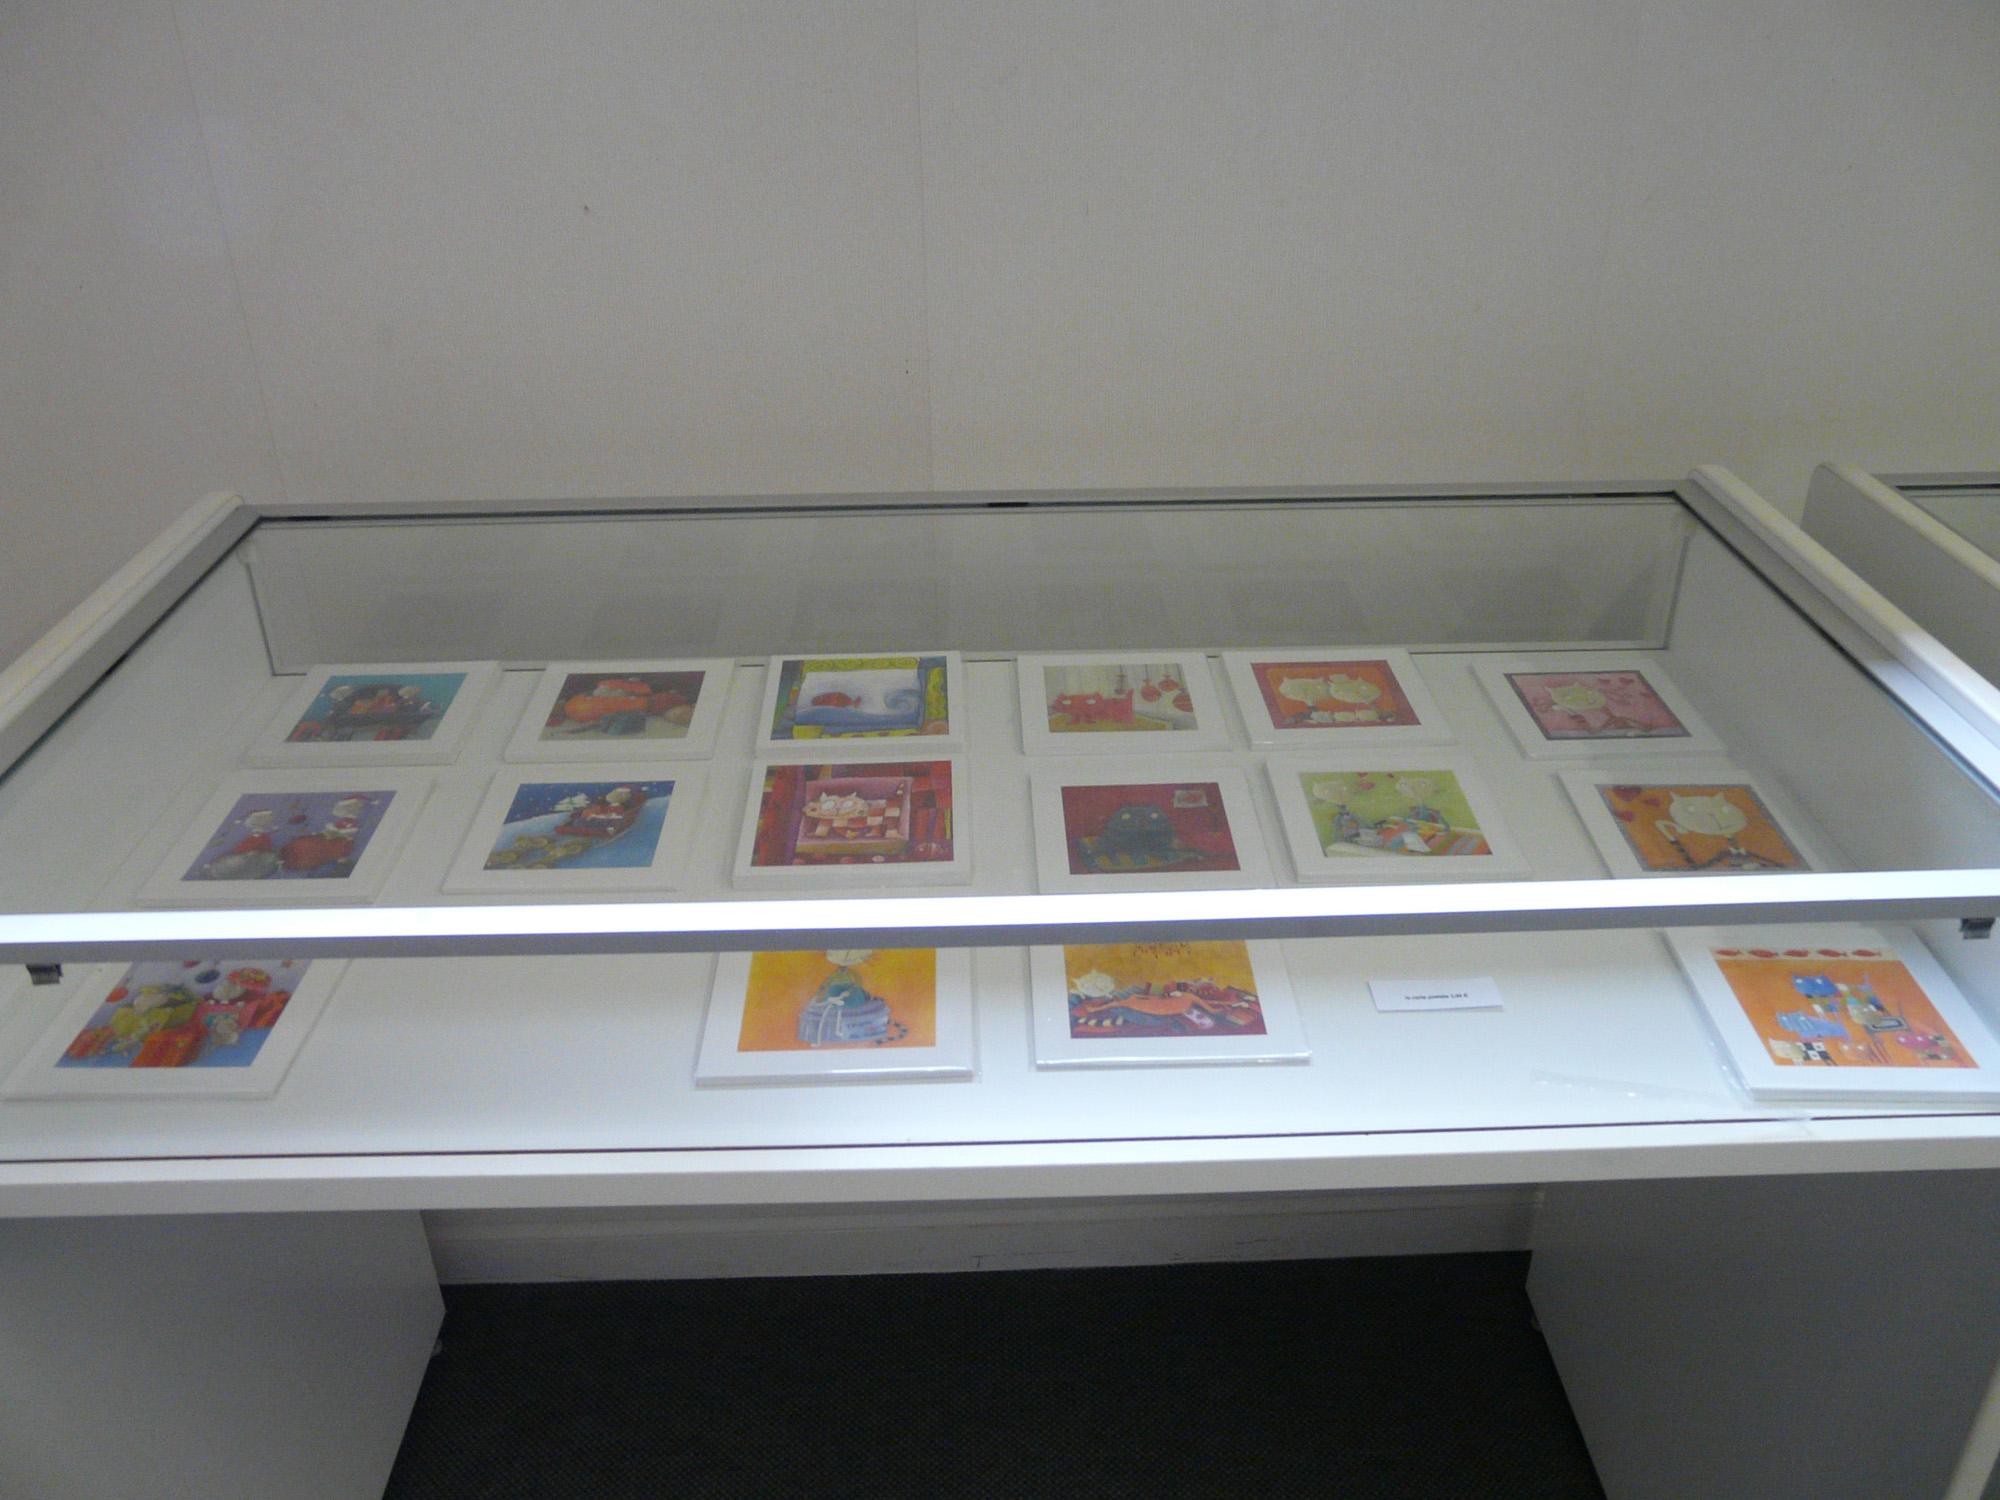 La vitrine des cartes postales